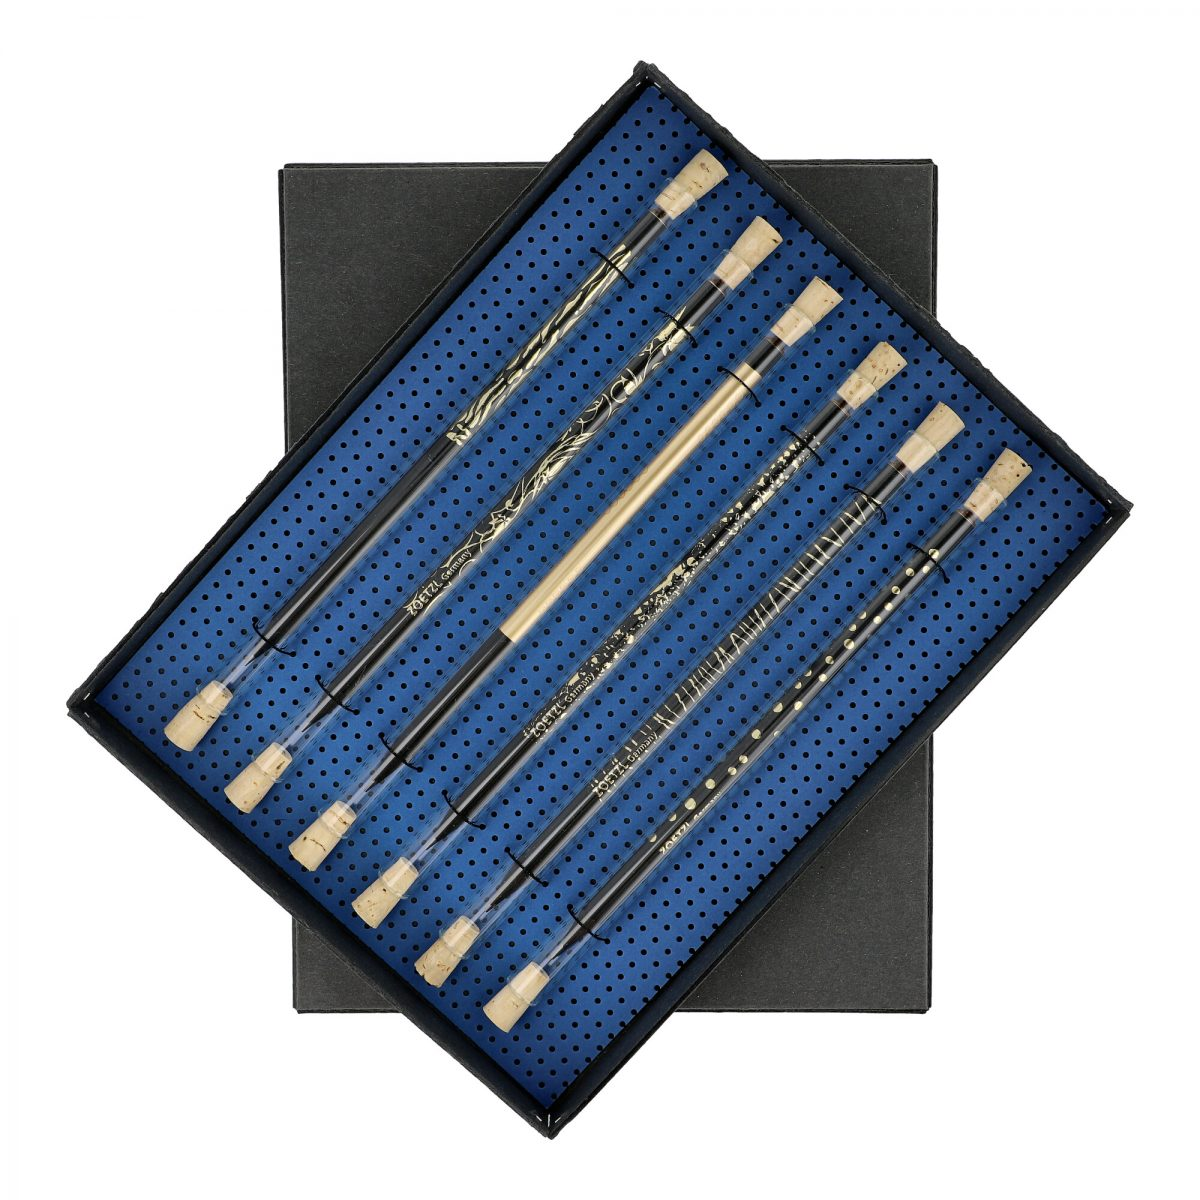 GS107  -  Trinkhalm & Pencil, Black & Gold